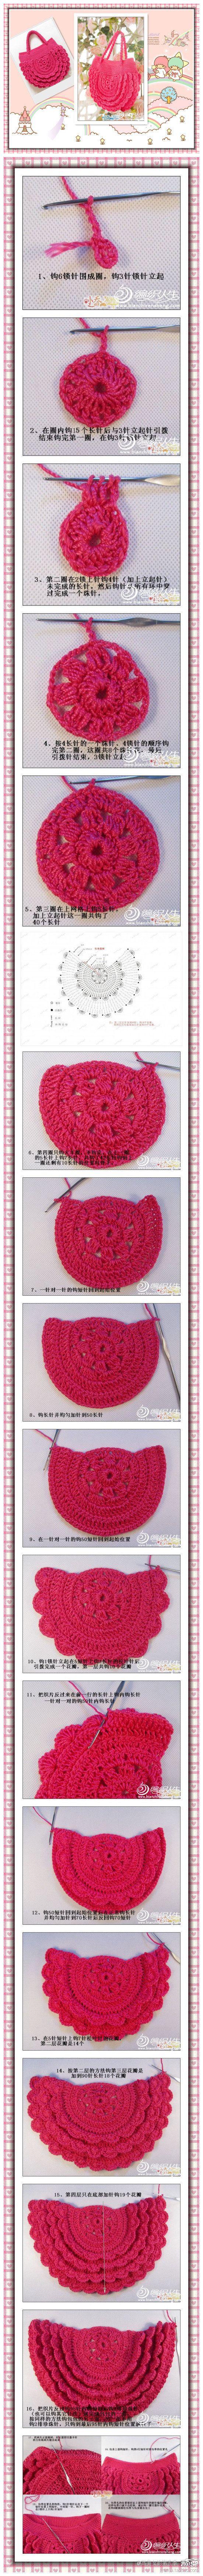 Crochet - casually stroll - Taobao